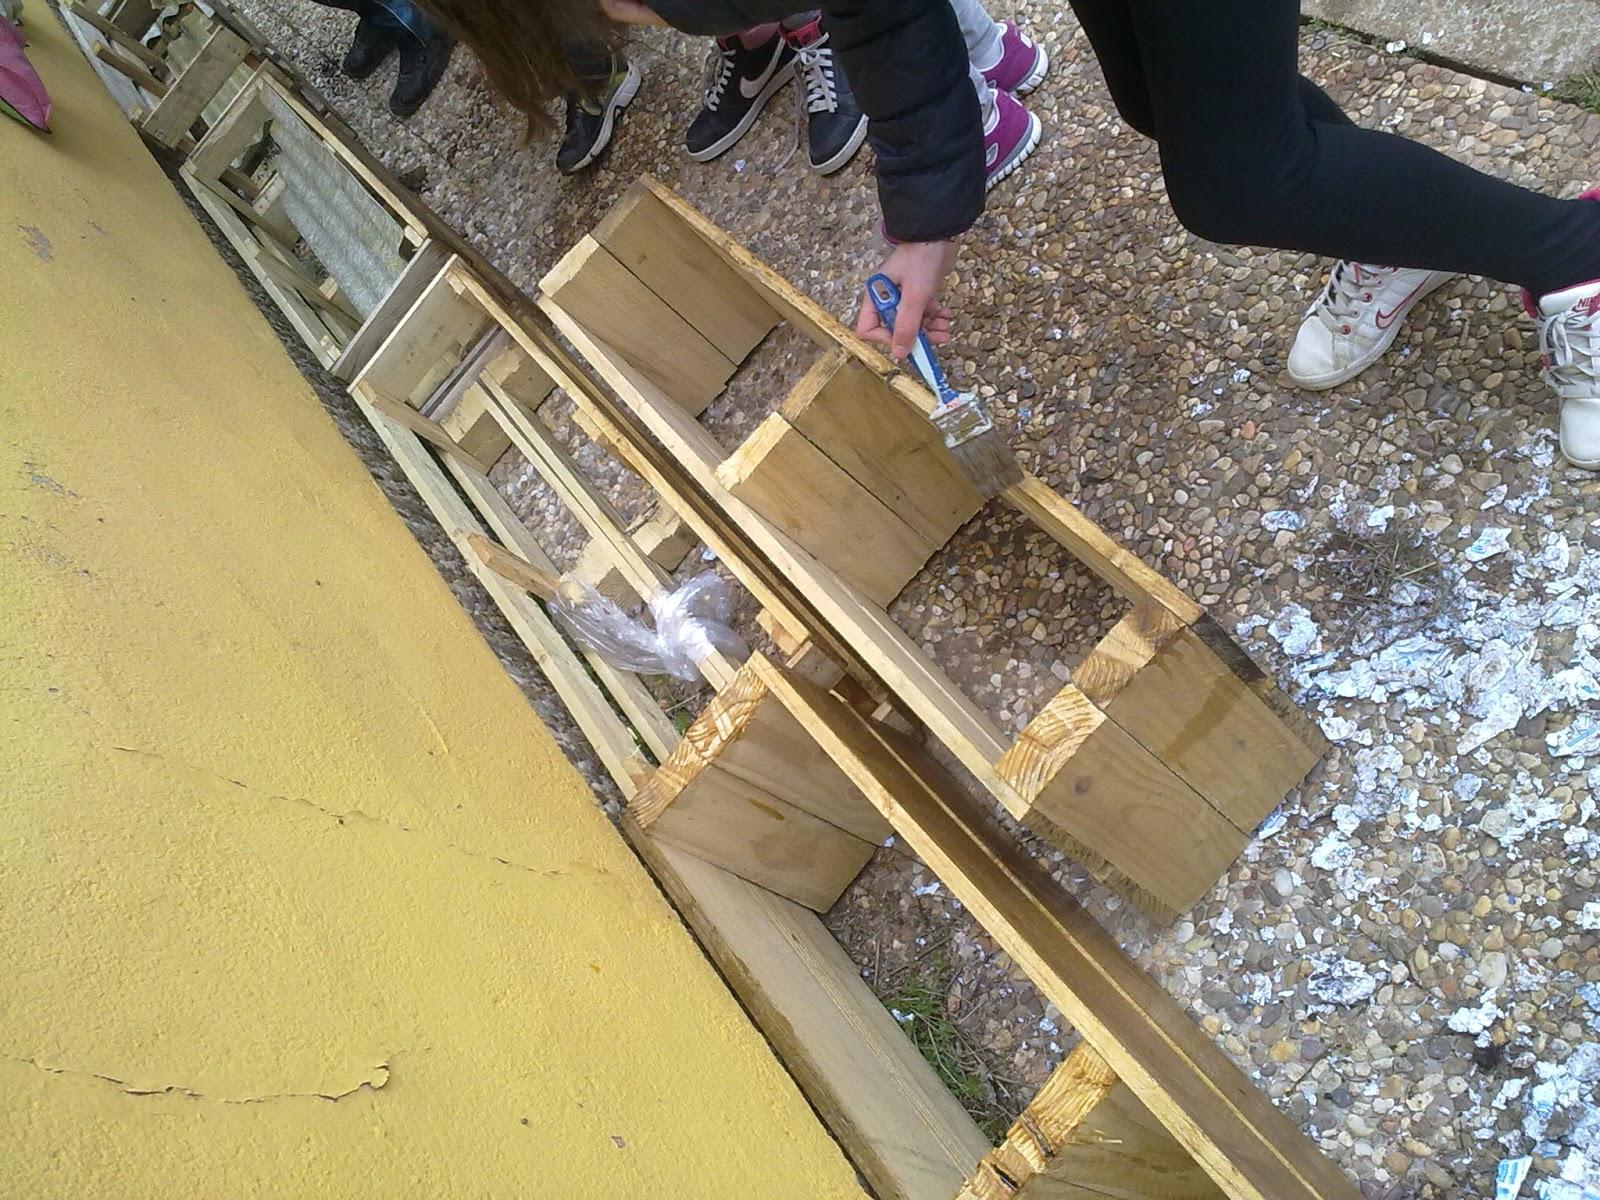 Huertogiraldo jardineras de madera - Jardinera de madera ...